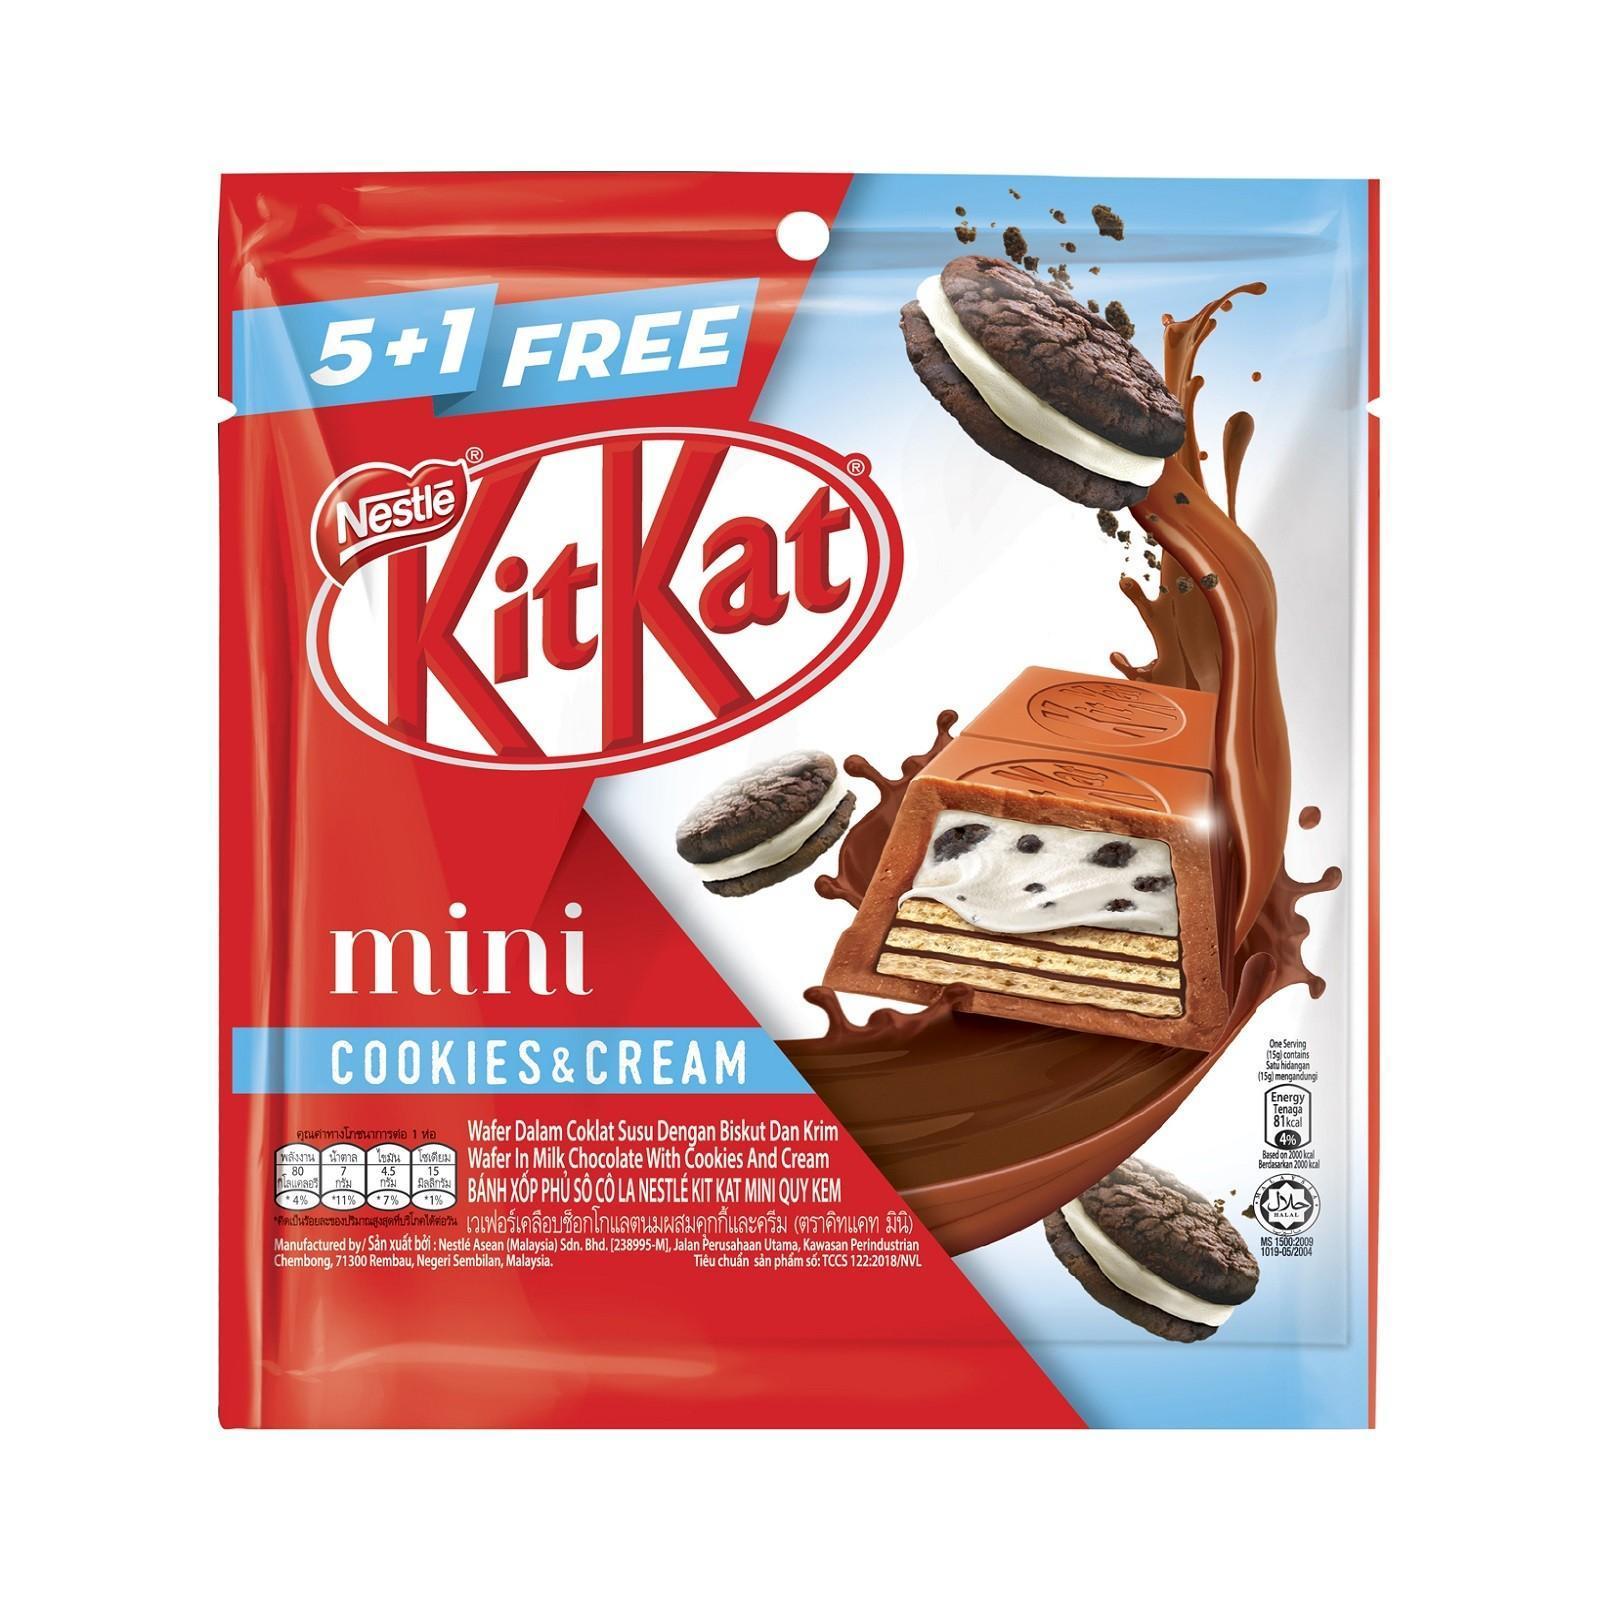 NESTLE KIT KAT Mini Cookies and Cream 5+1 Share Bag